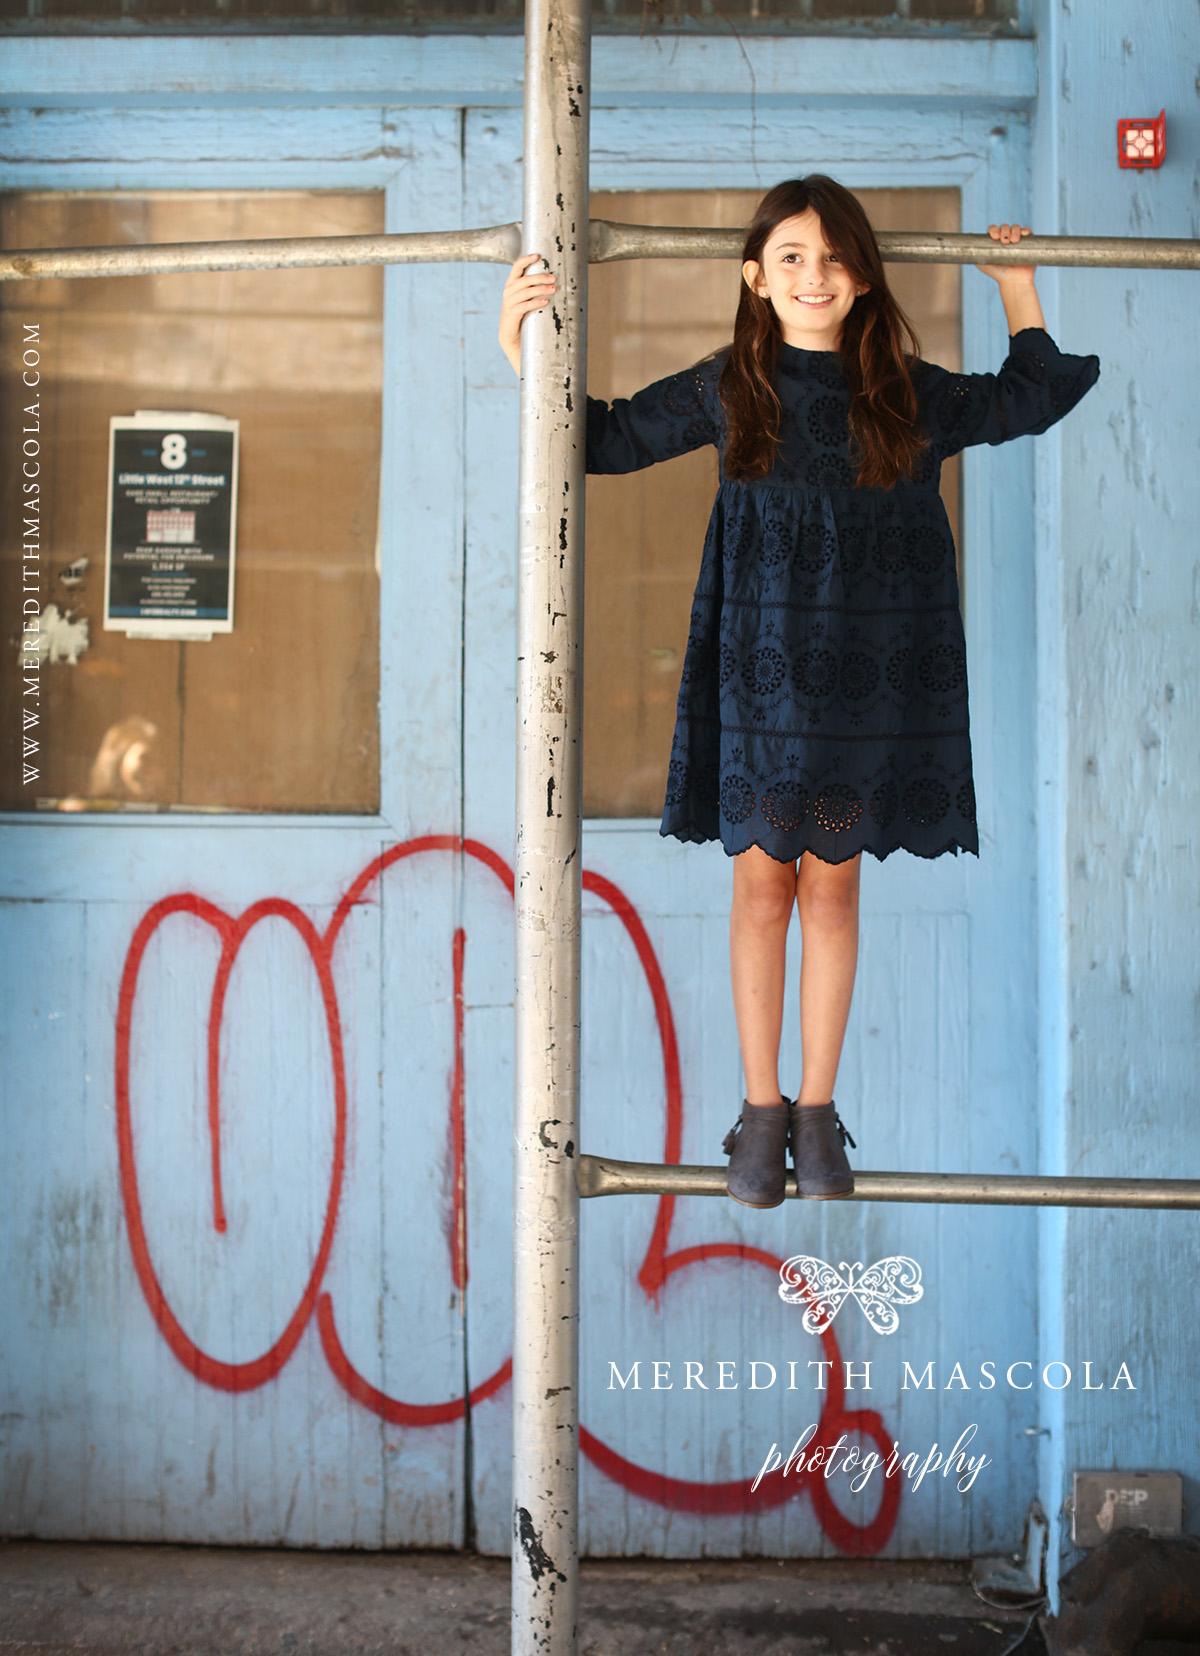 nycfamilyphotographer2.jpg